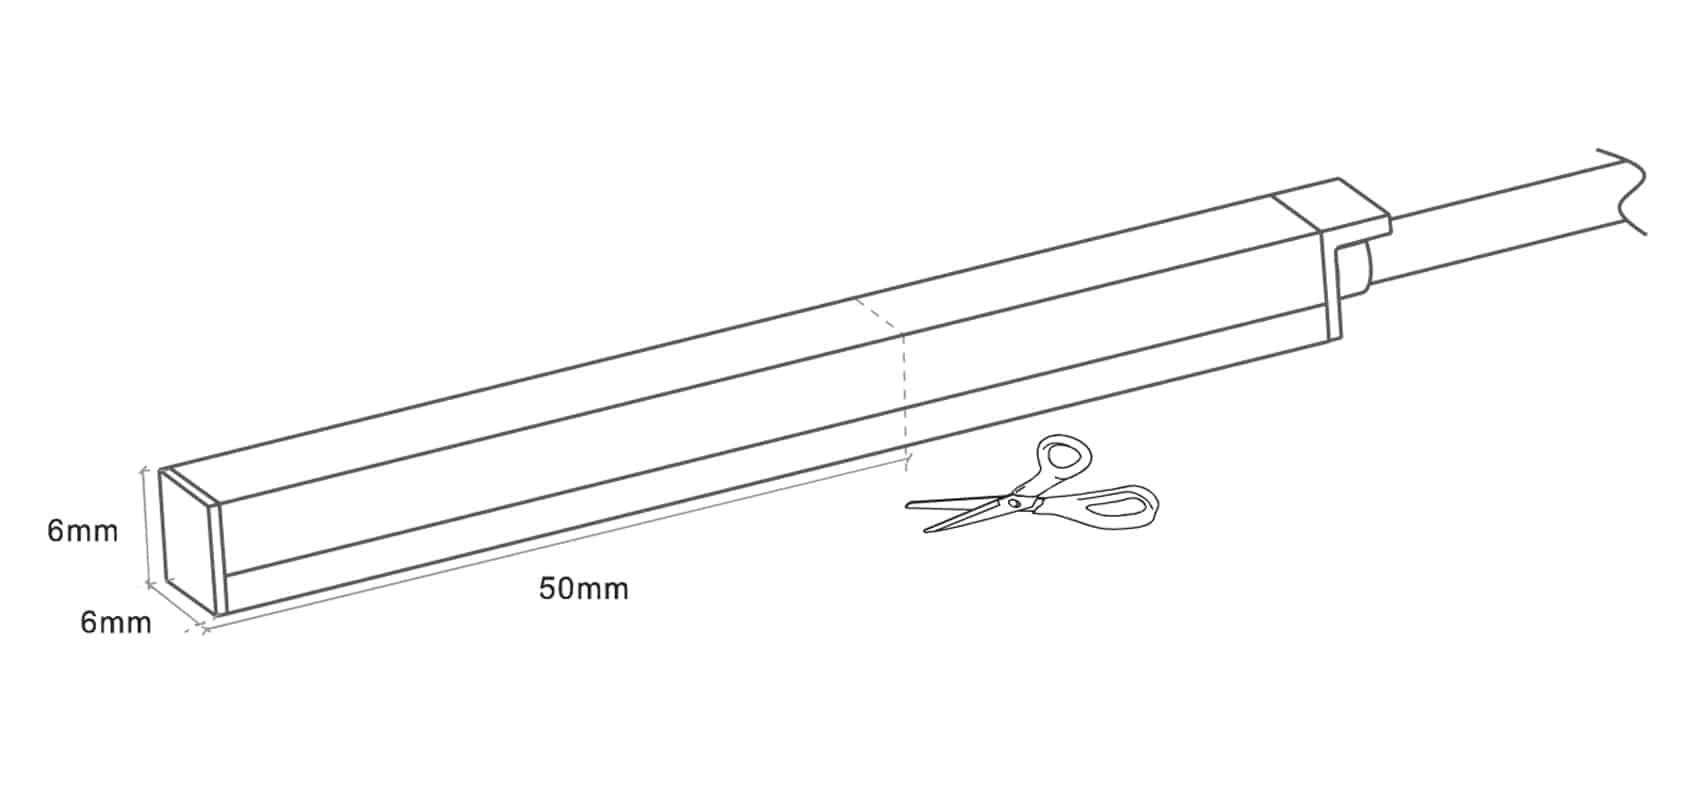 Neon-Flex-Slim Top Bend - 6x6mm - Single color - Dia